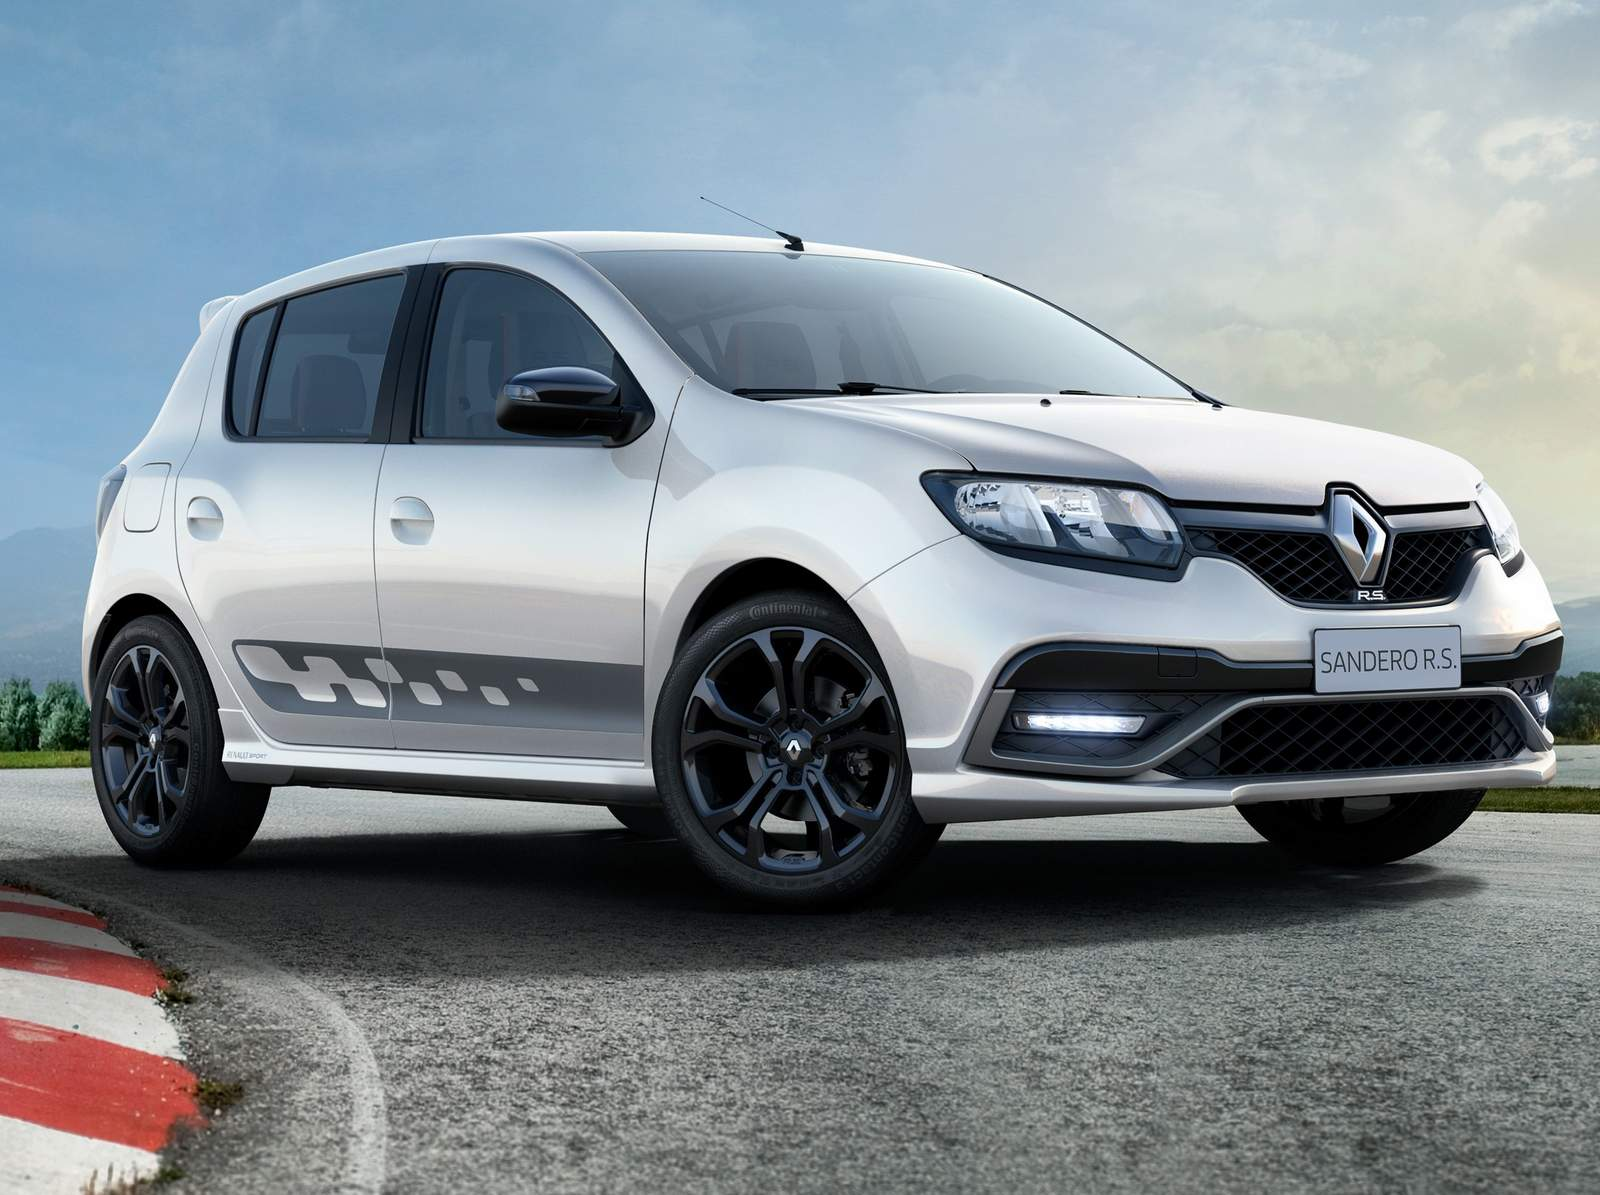 Renault Sandero R.S. 2.0 16V - Preço